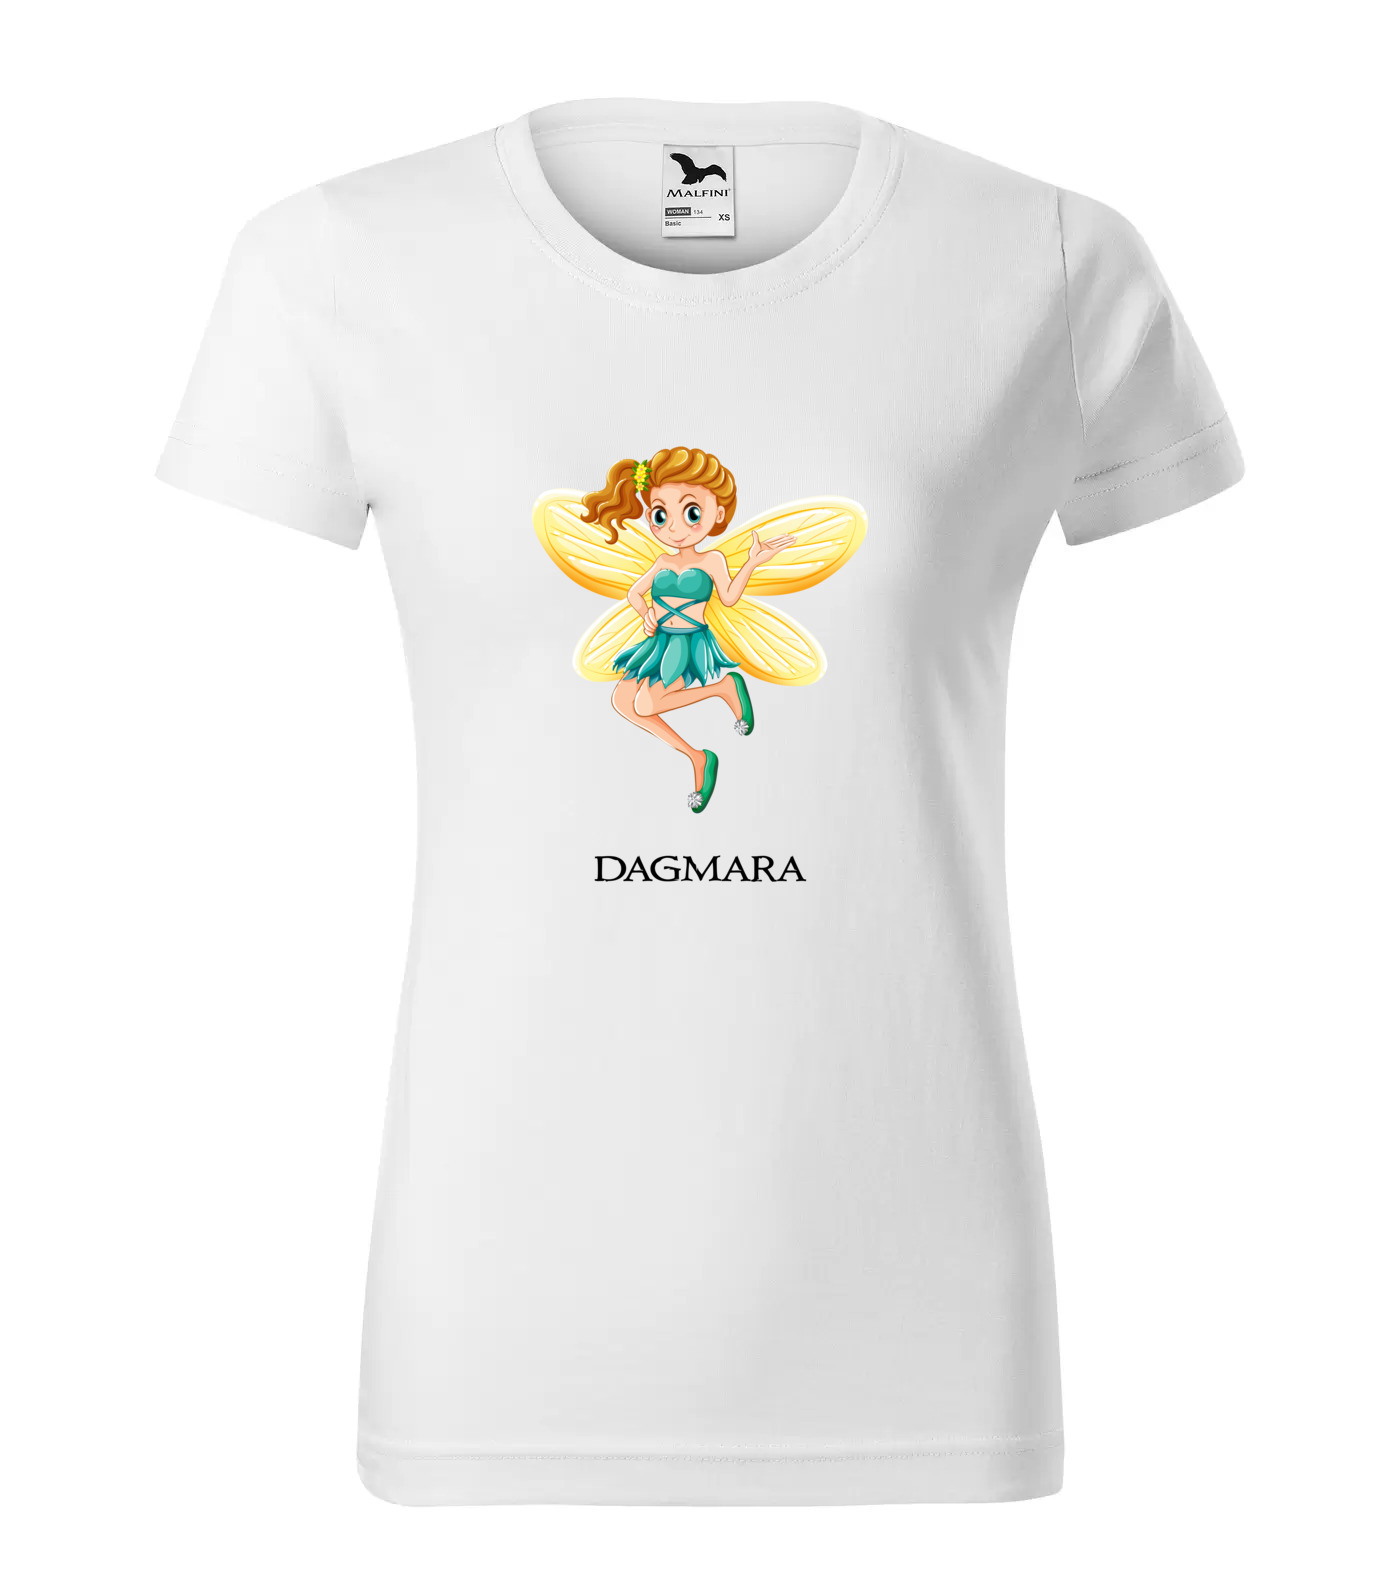 Tričko Víla Dagmara